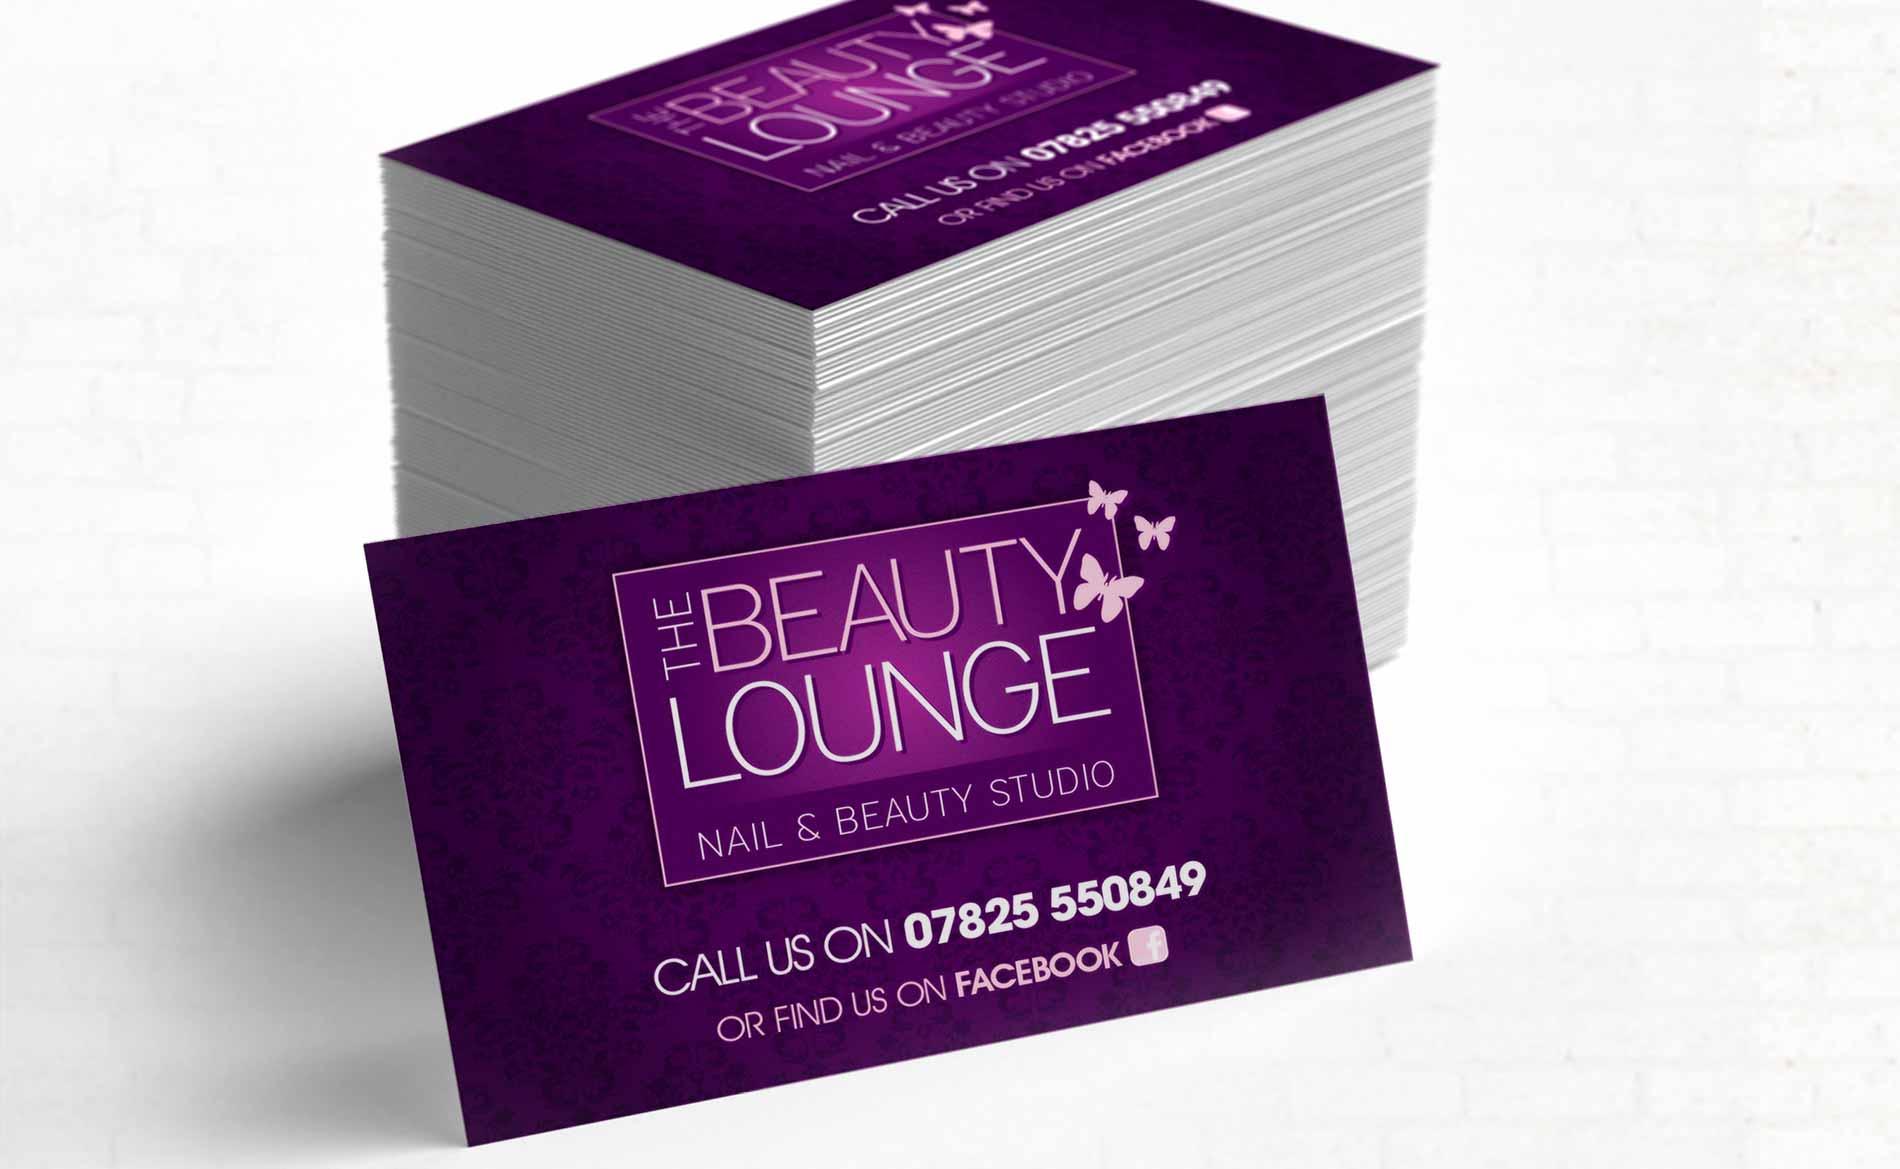 Famous beauty business cards ideas business card ideas etadamfo comfortable beauty business cards photos business card ideas colourmoves Image collections